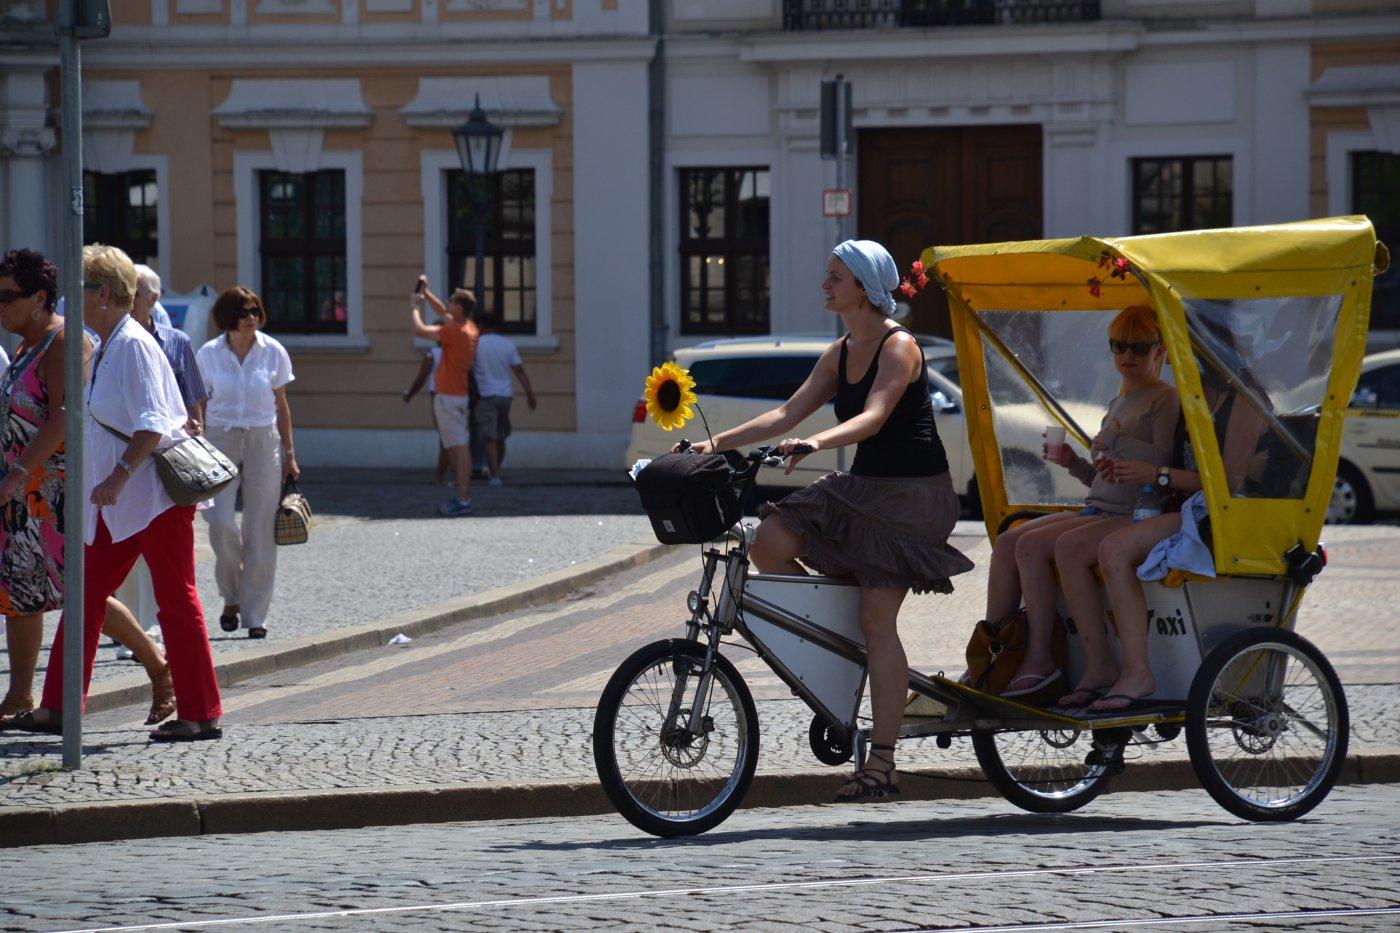 Mini Kühlschrank Dresden : Kulturreise dresden mit ticket staatsoperette compact tours